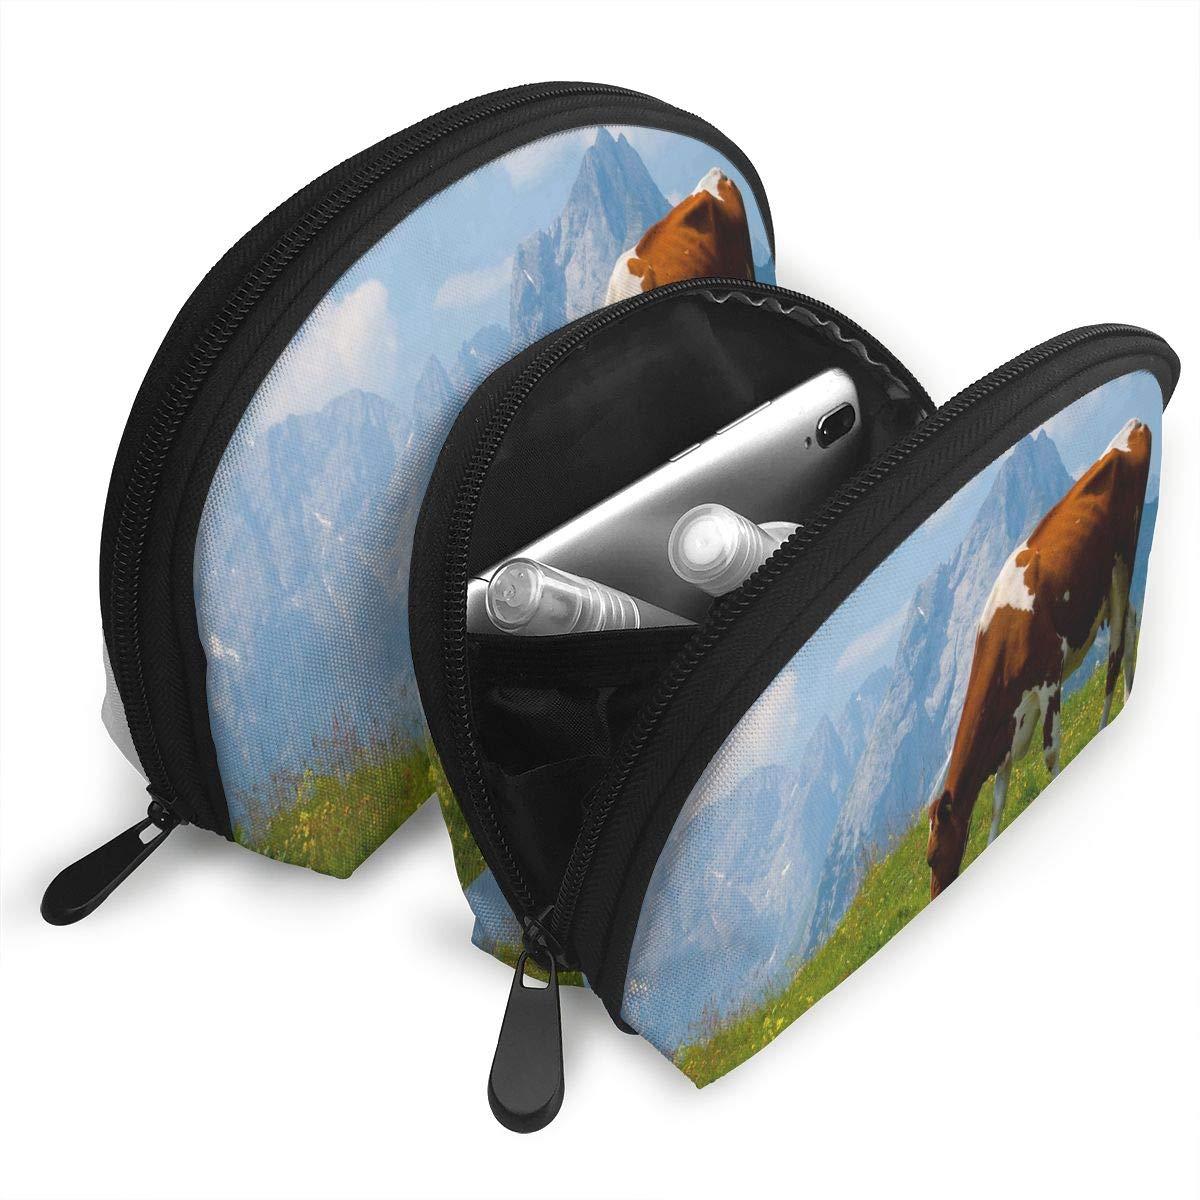 Amazon.com: Guali Bolsa de almacenamiento portátil para ...